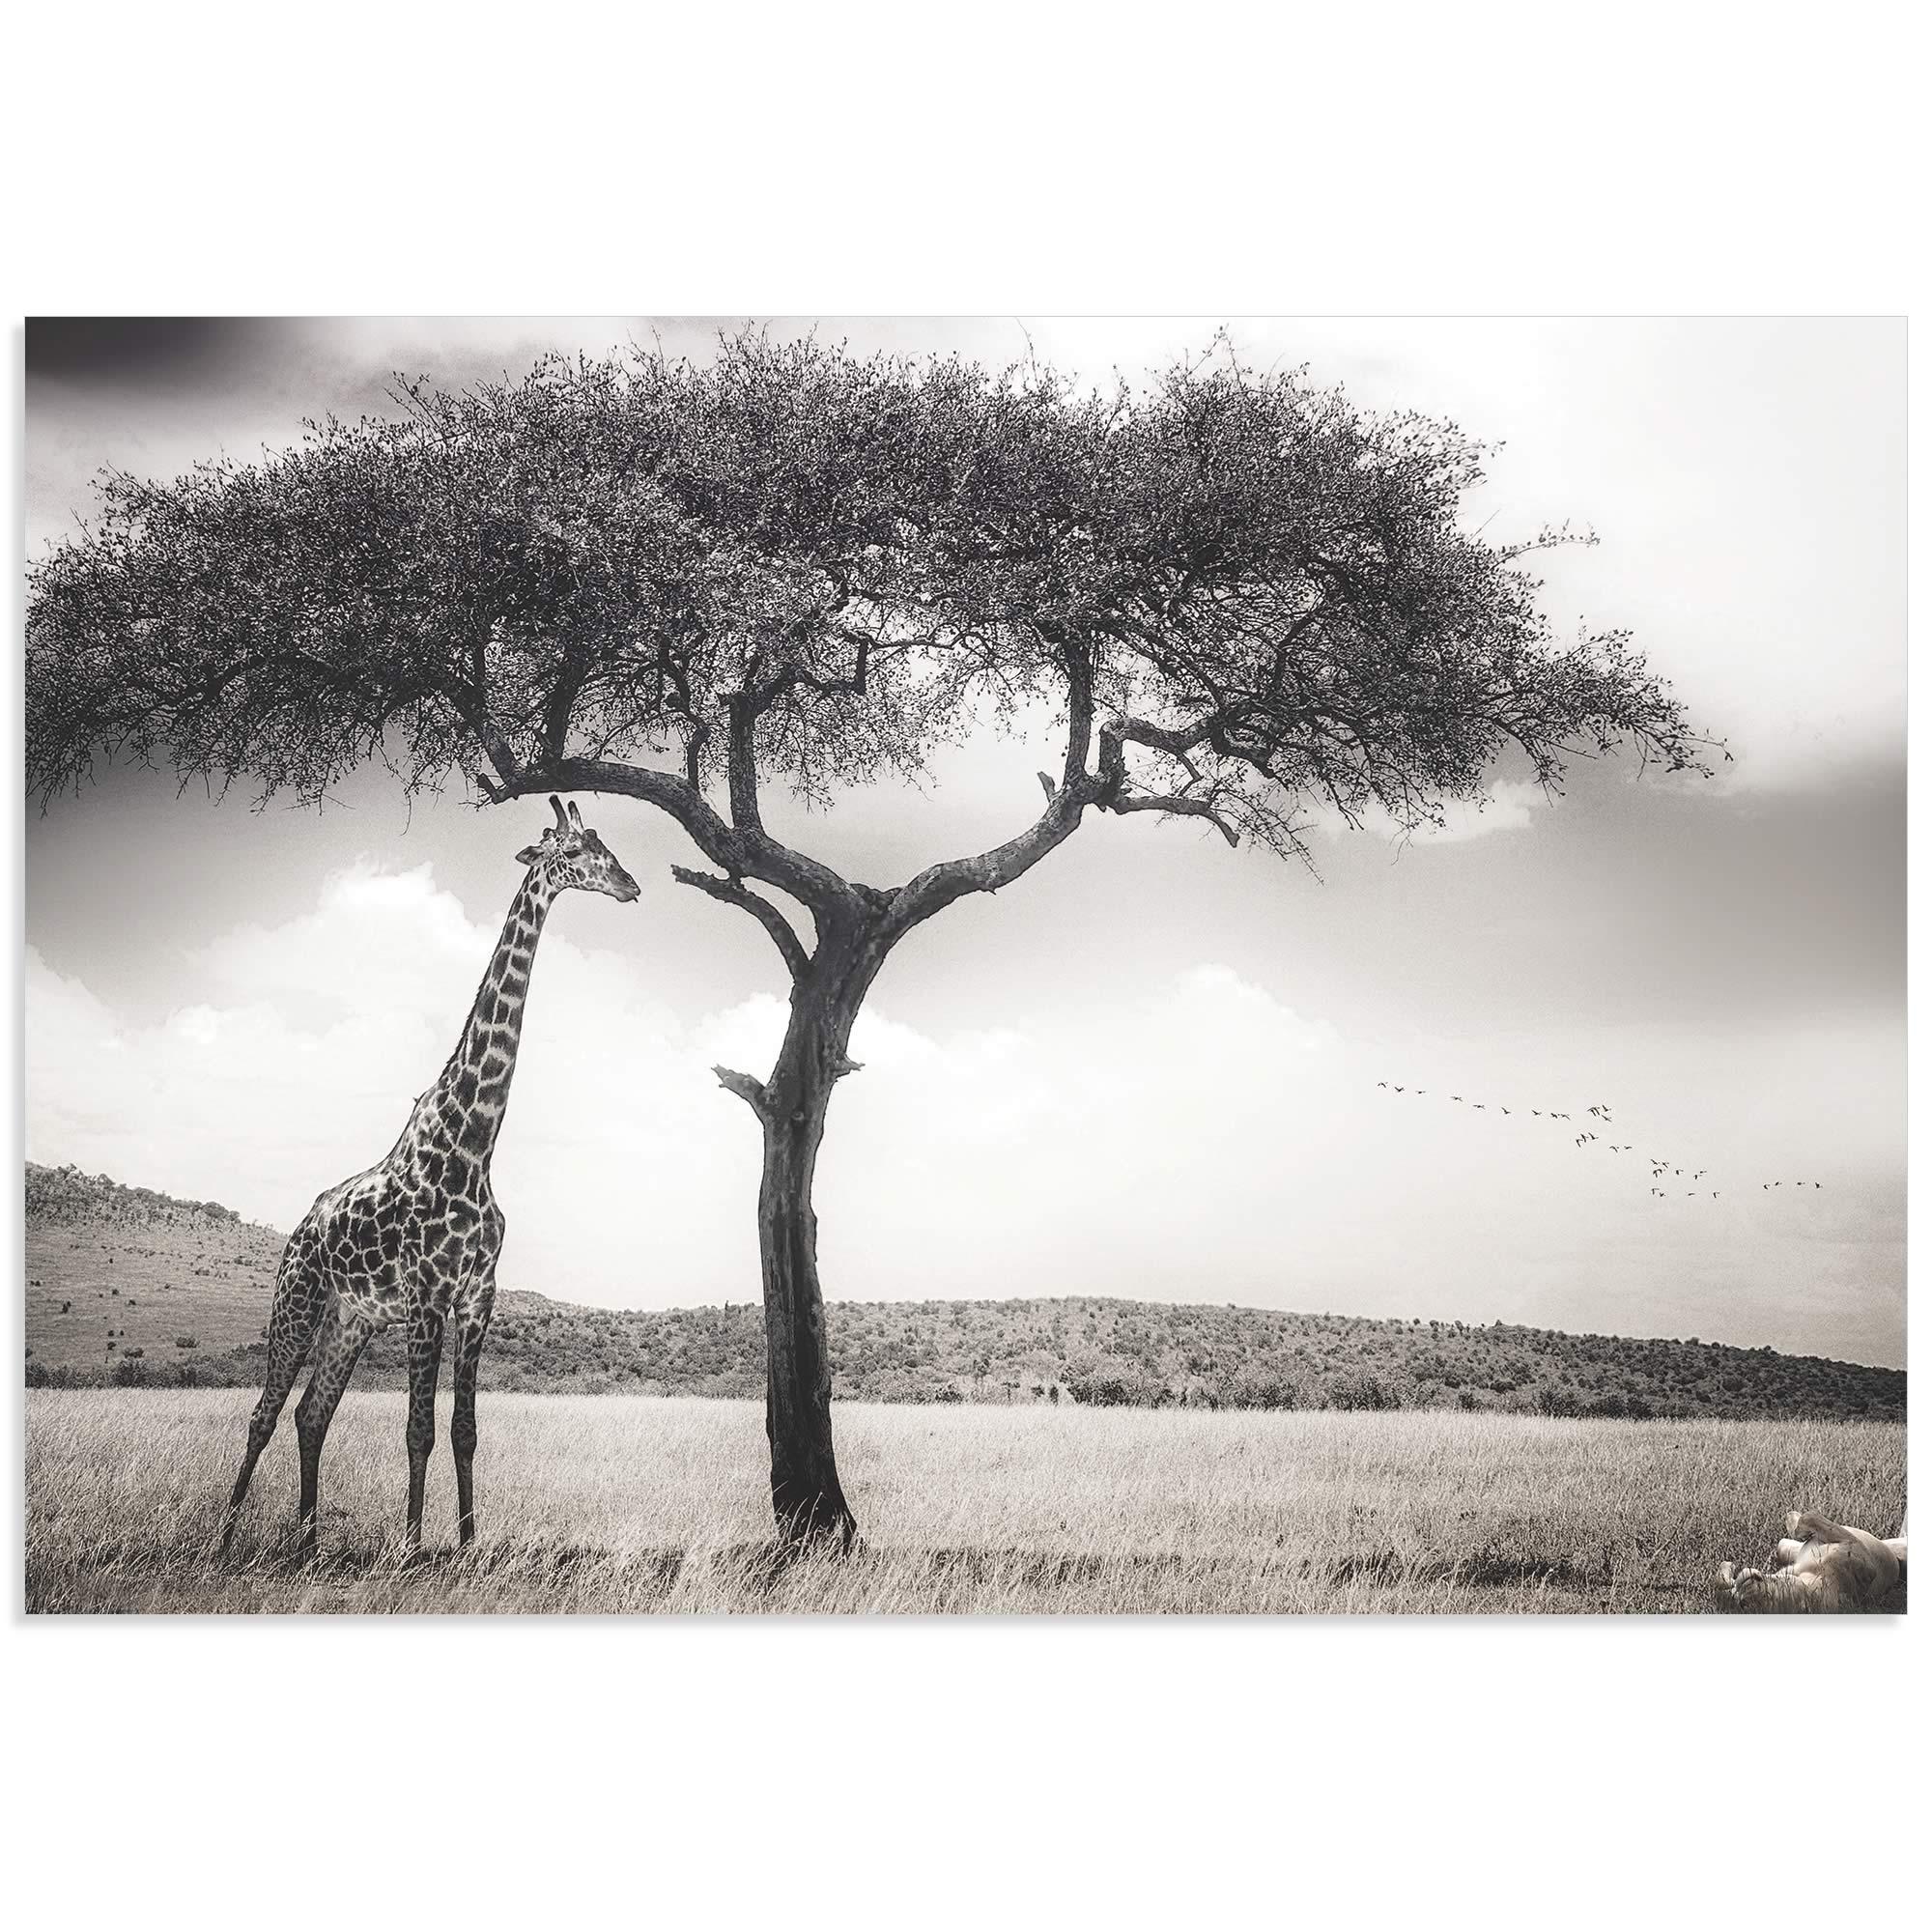 Under the African Sun by Piet Flour - Giraffe Wall Art on Metal or Acrylic